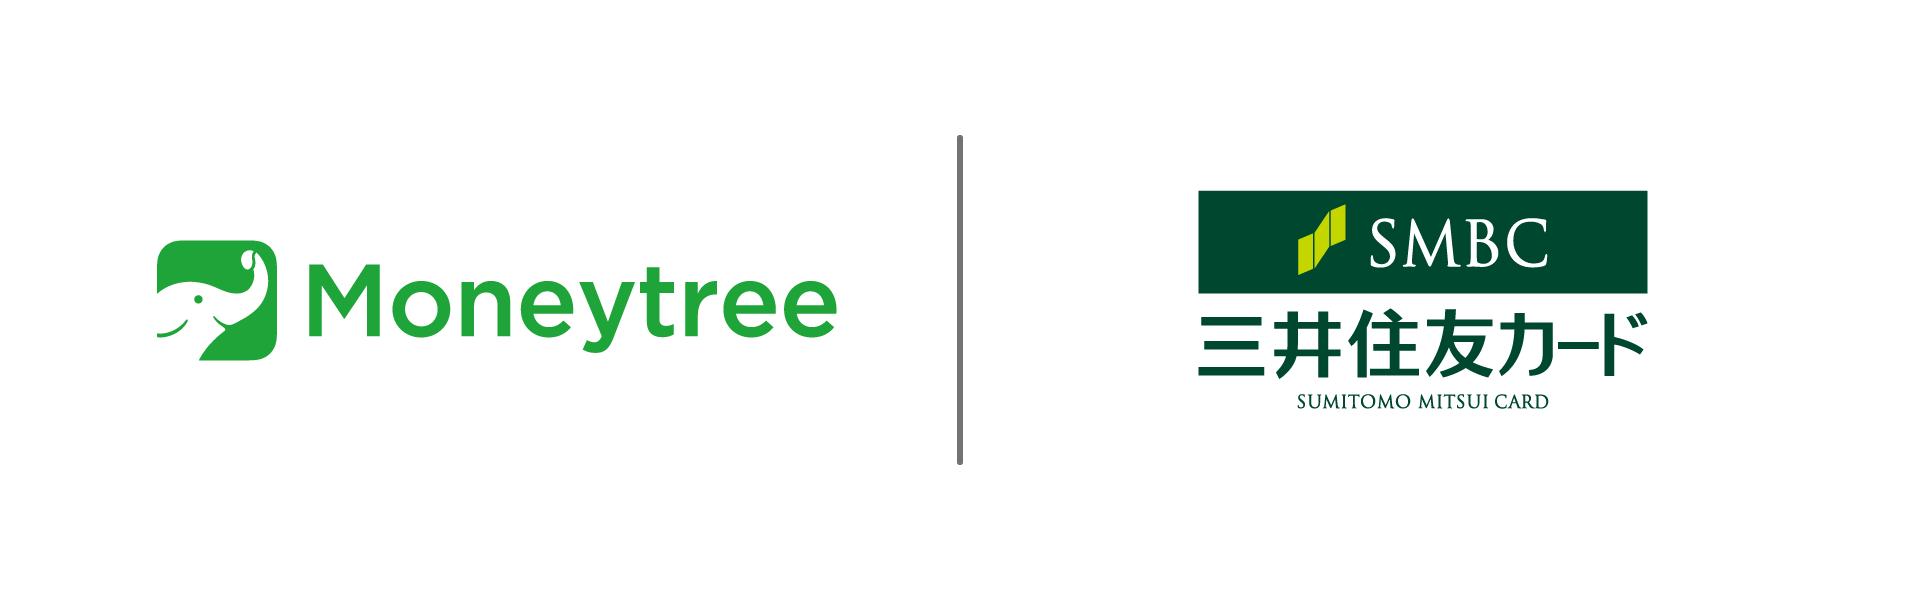 PressRelease SMCC Logo